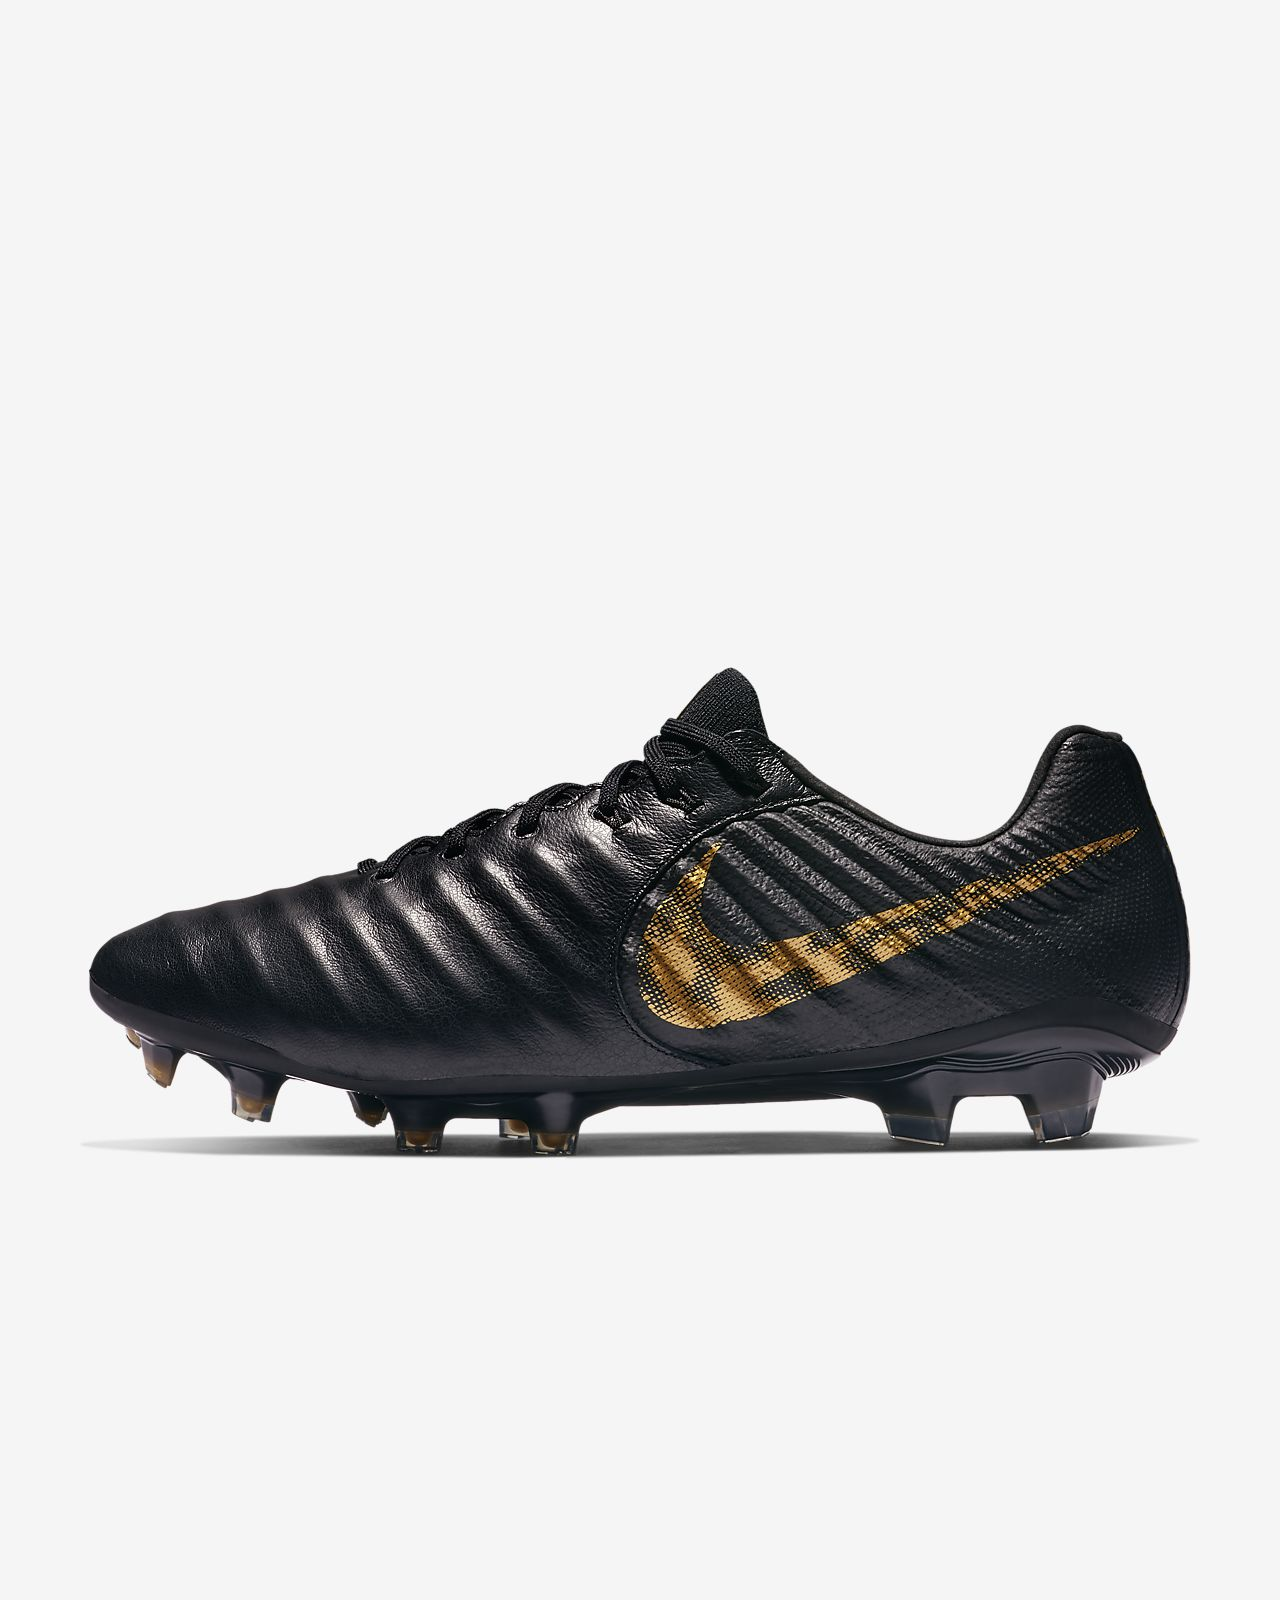 Nike Tiempo Legend 7 Elite FG Firm-Ground Football Boot